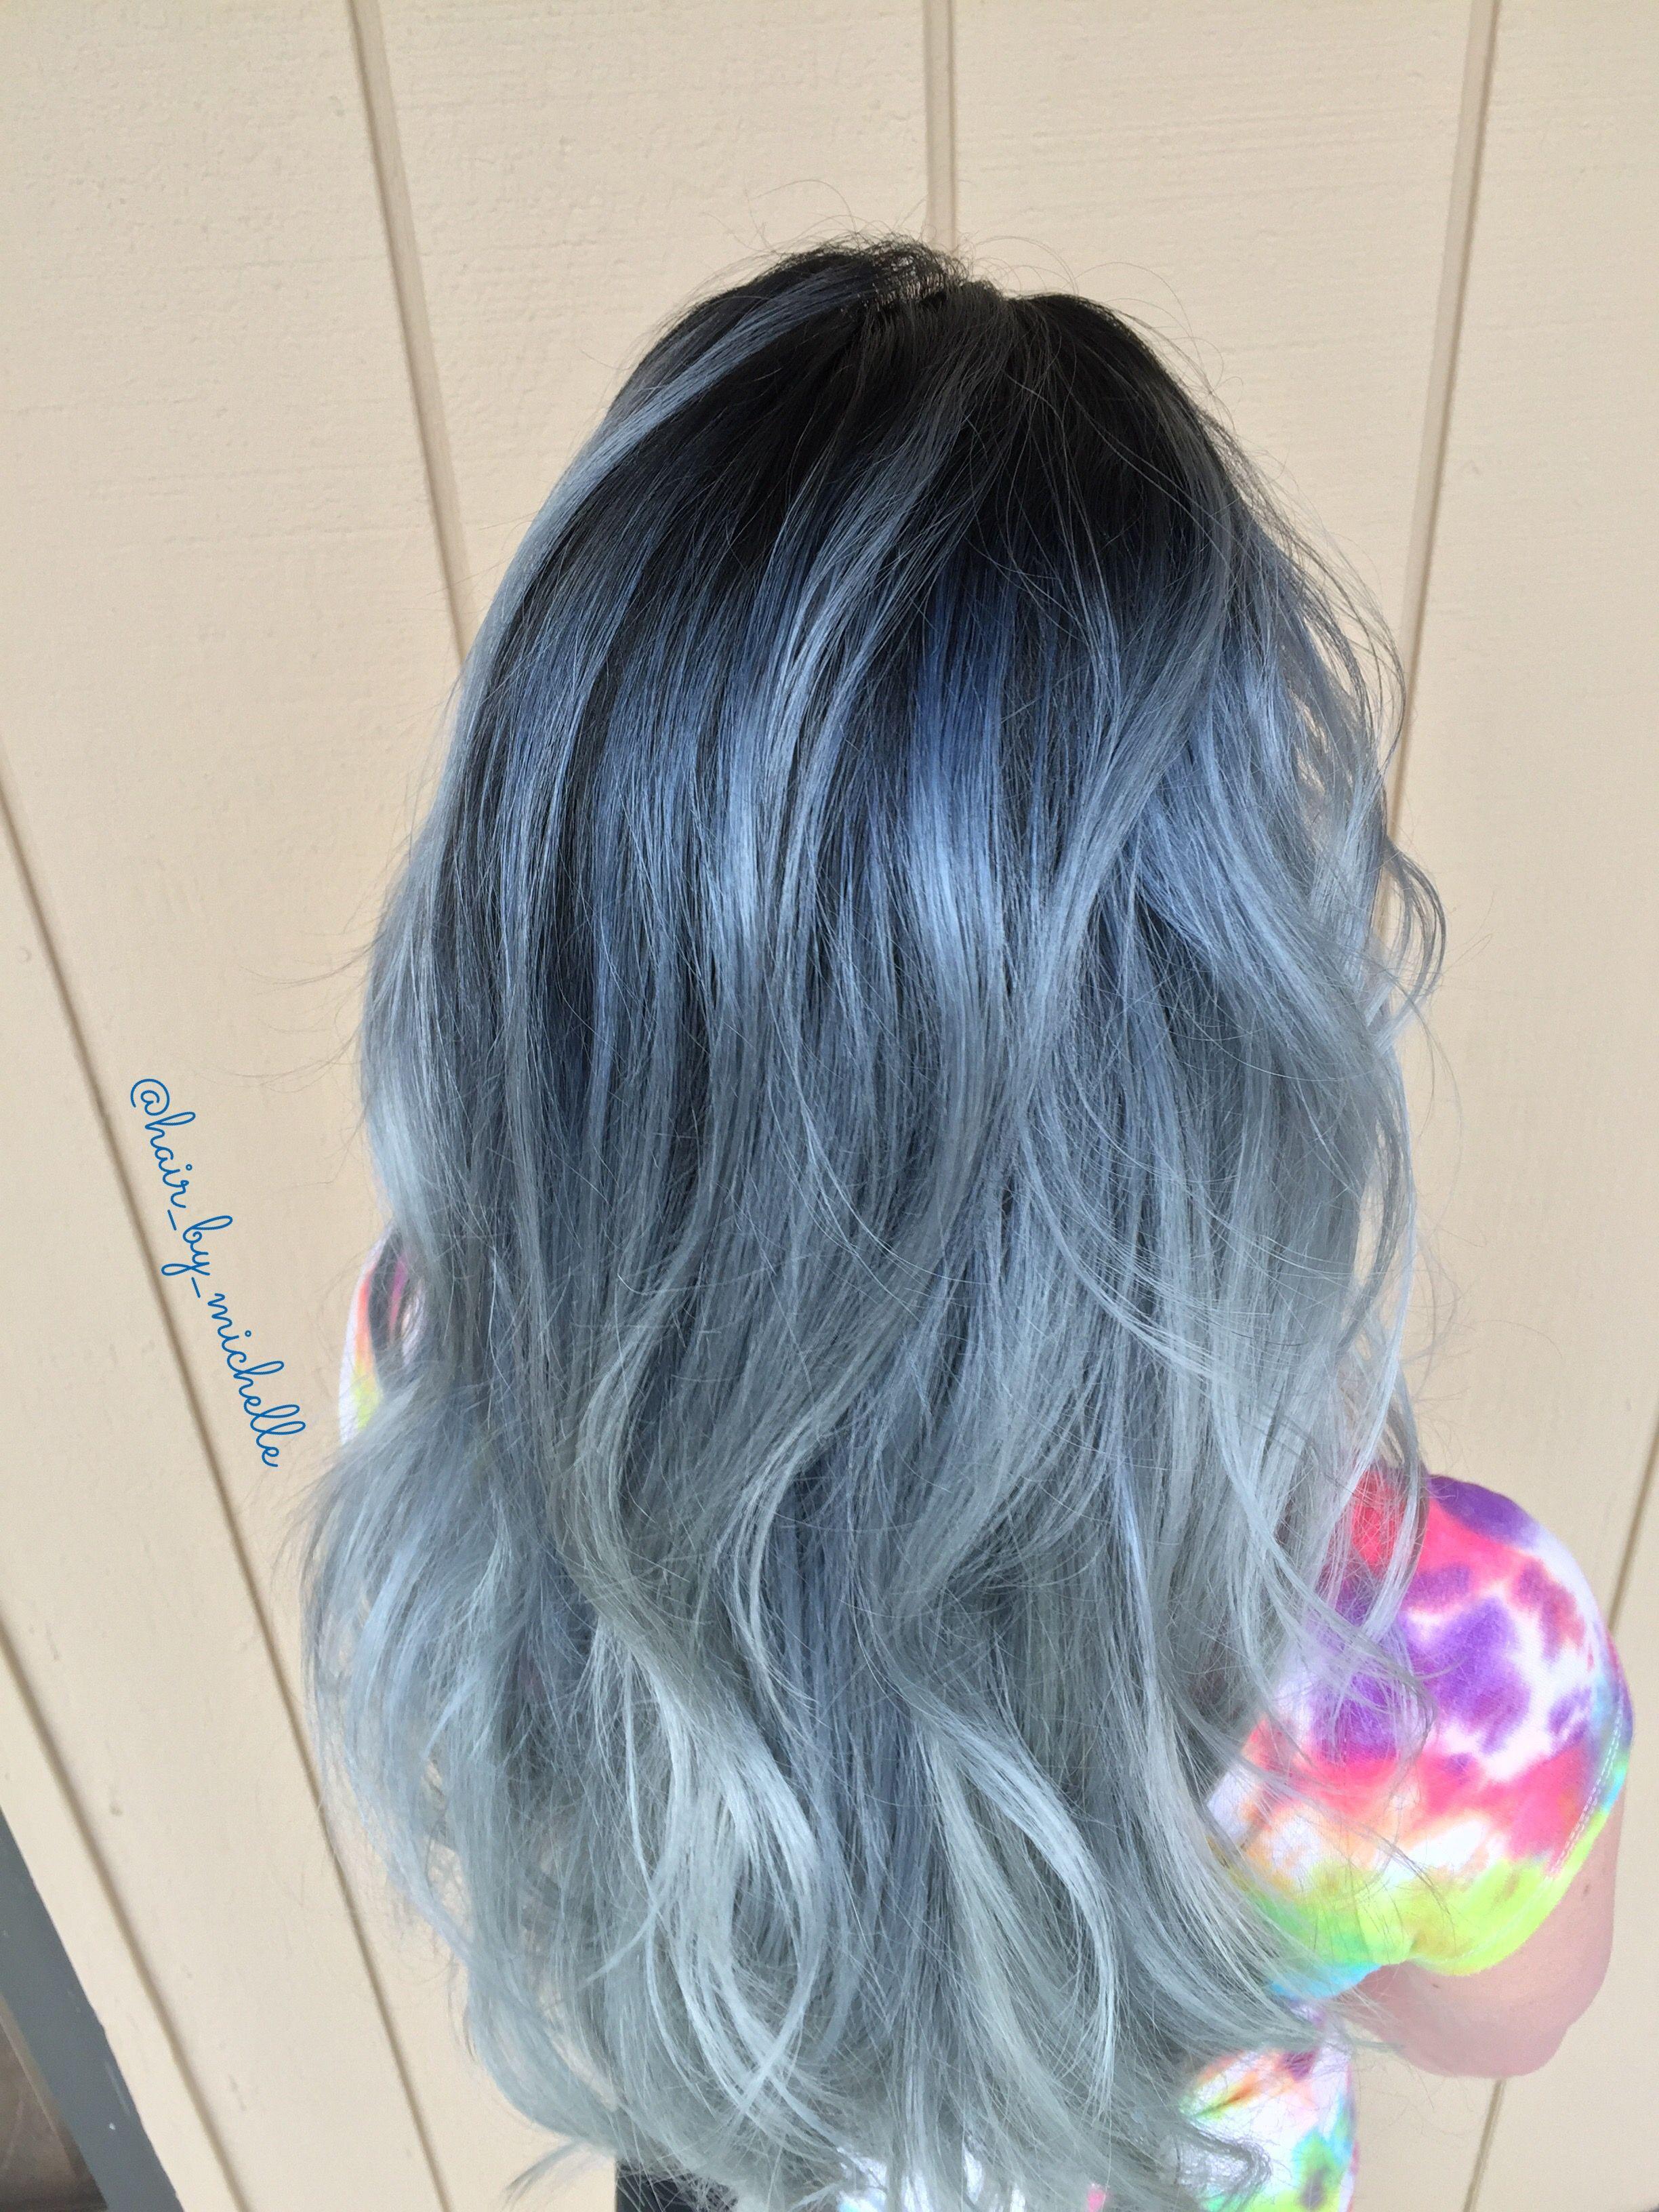 Denim Hair Blue And Silver Balayage